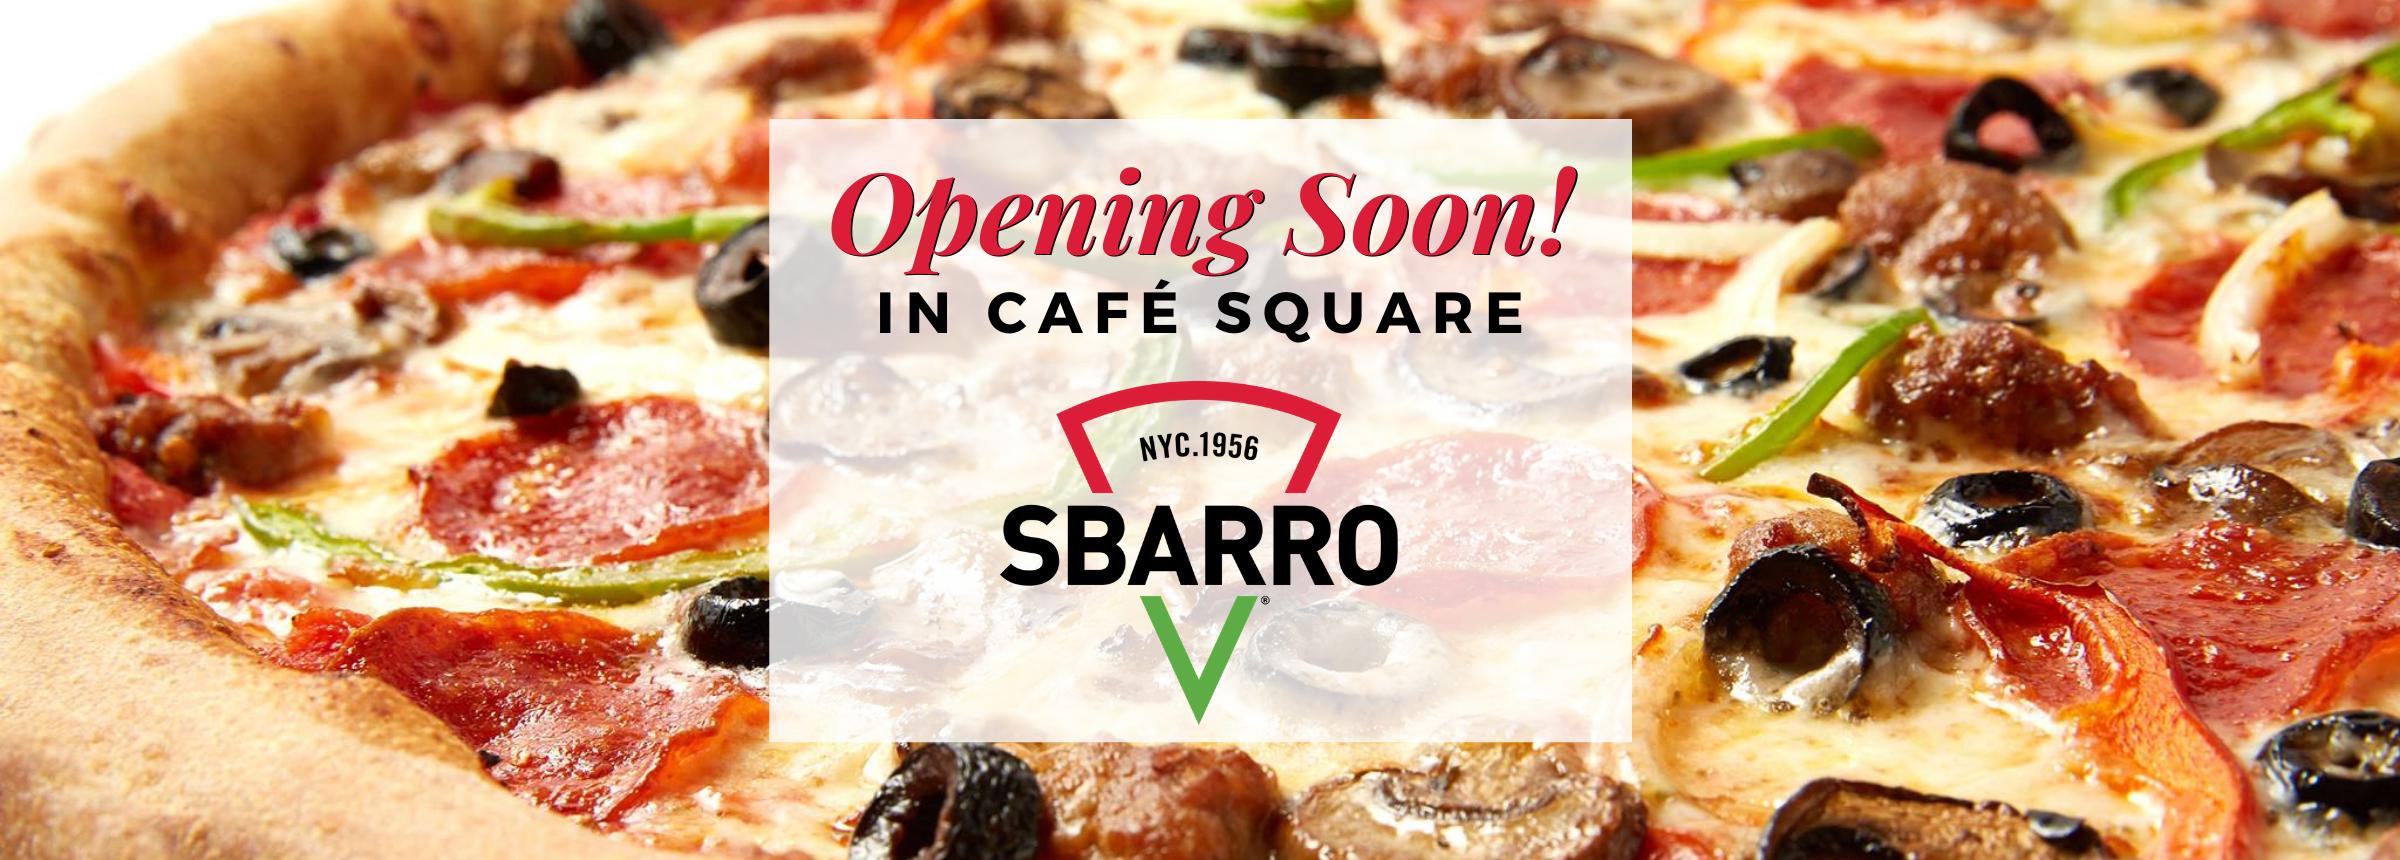 Opening Soon Website Hero Image Sbarro